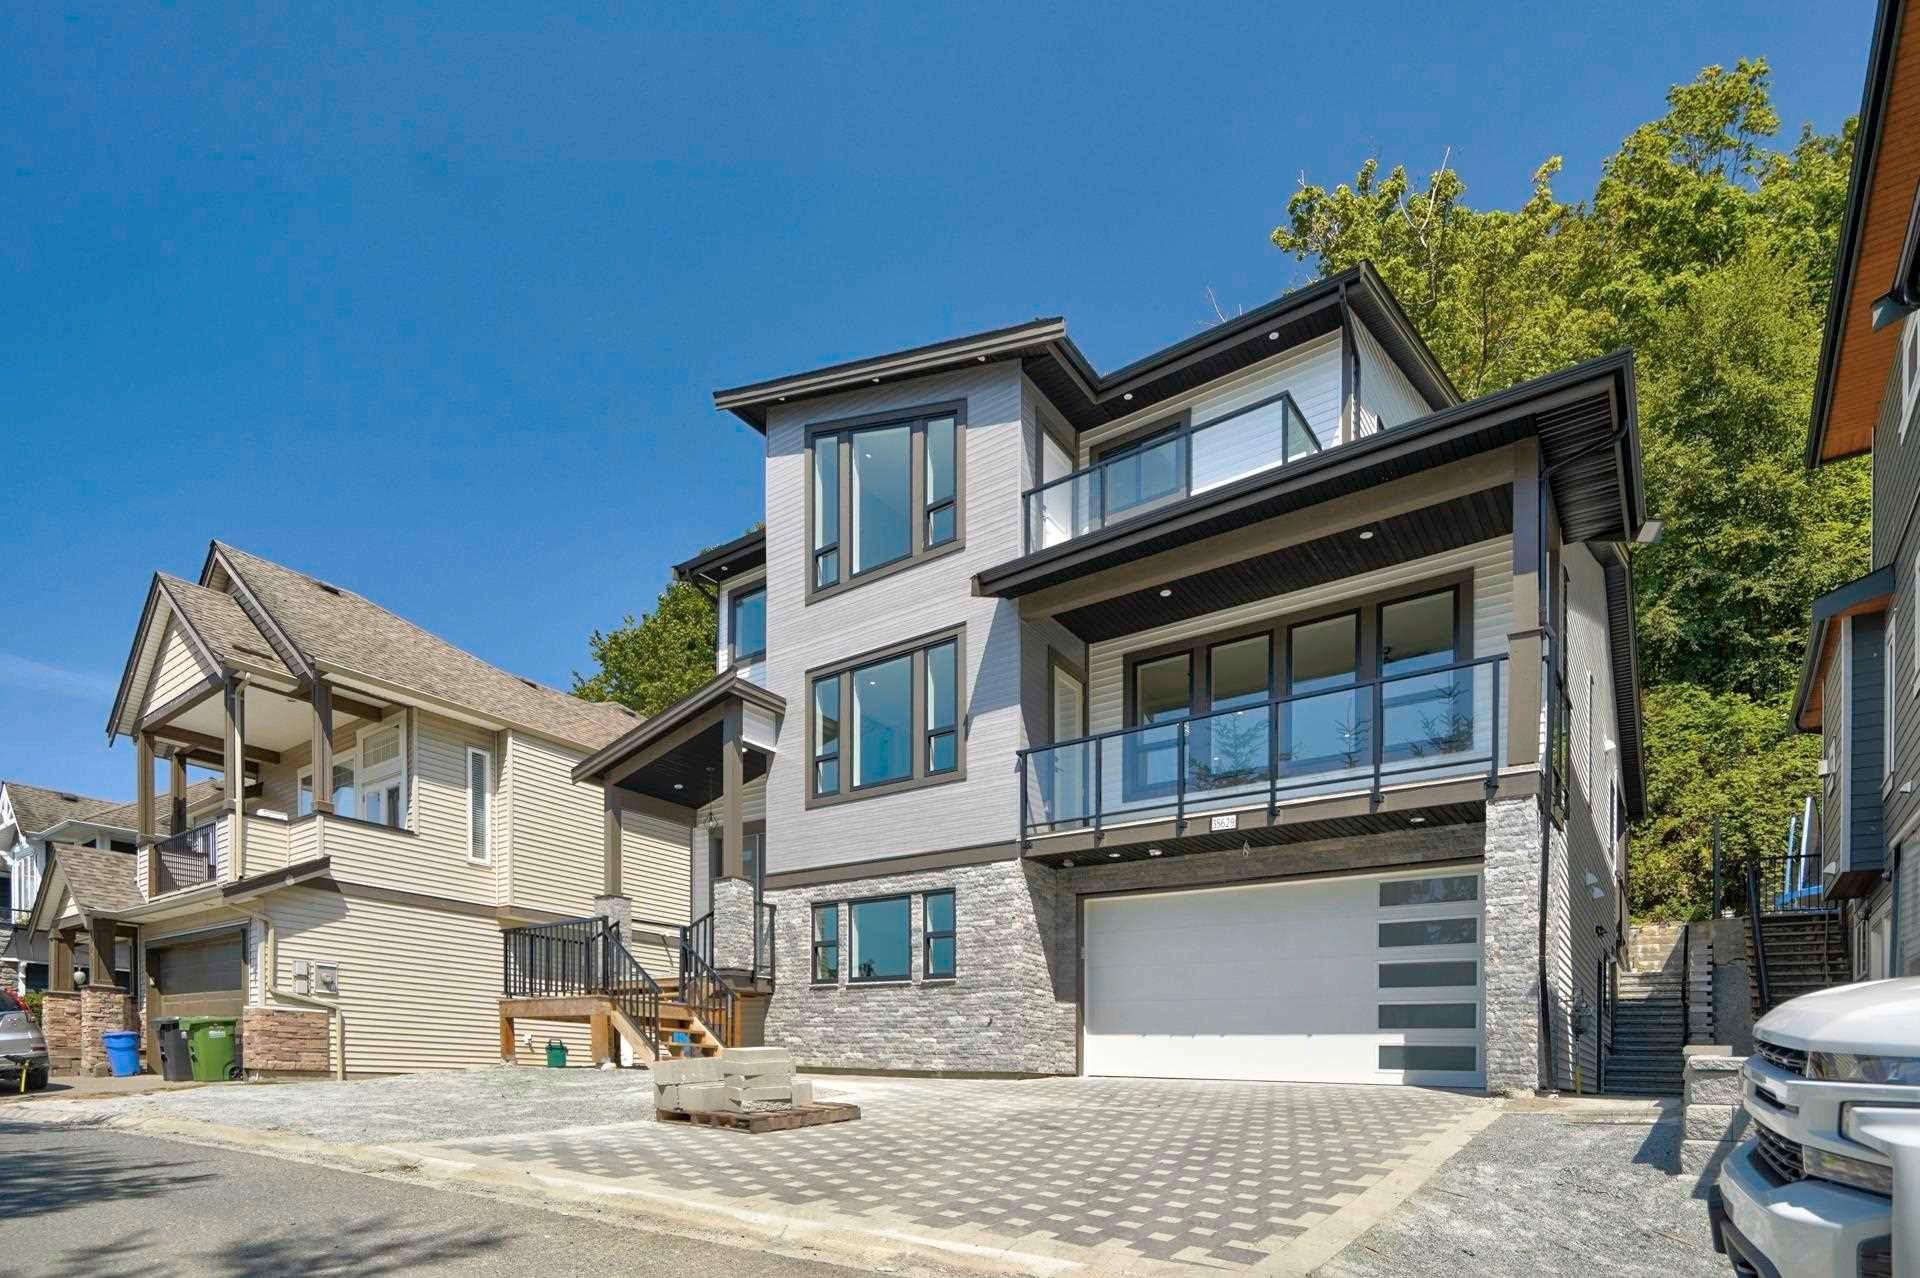 Main Photo: 35629 ZANATTA Place in Abbotsford: Abbotsford East House for sale : MLS®# R2607783